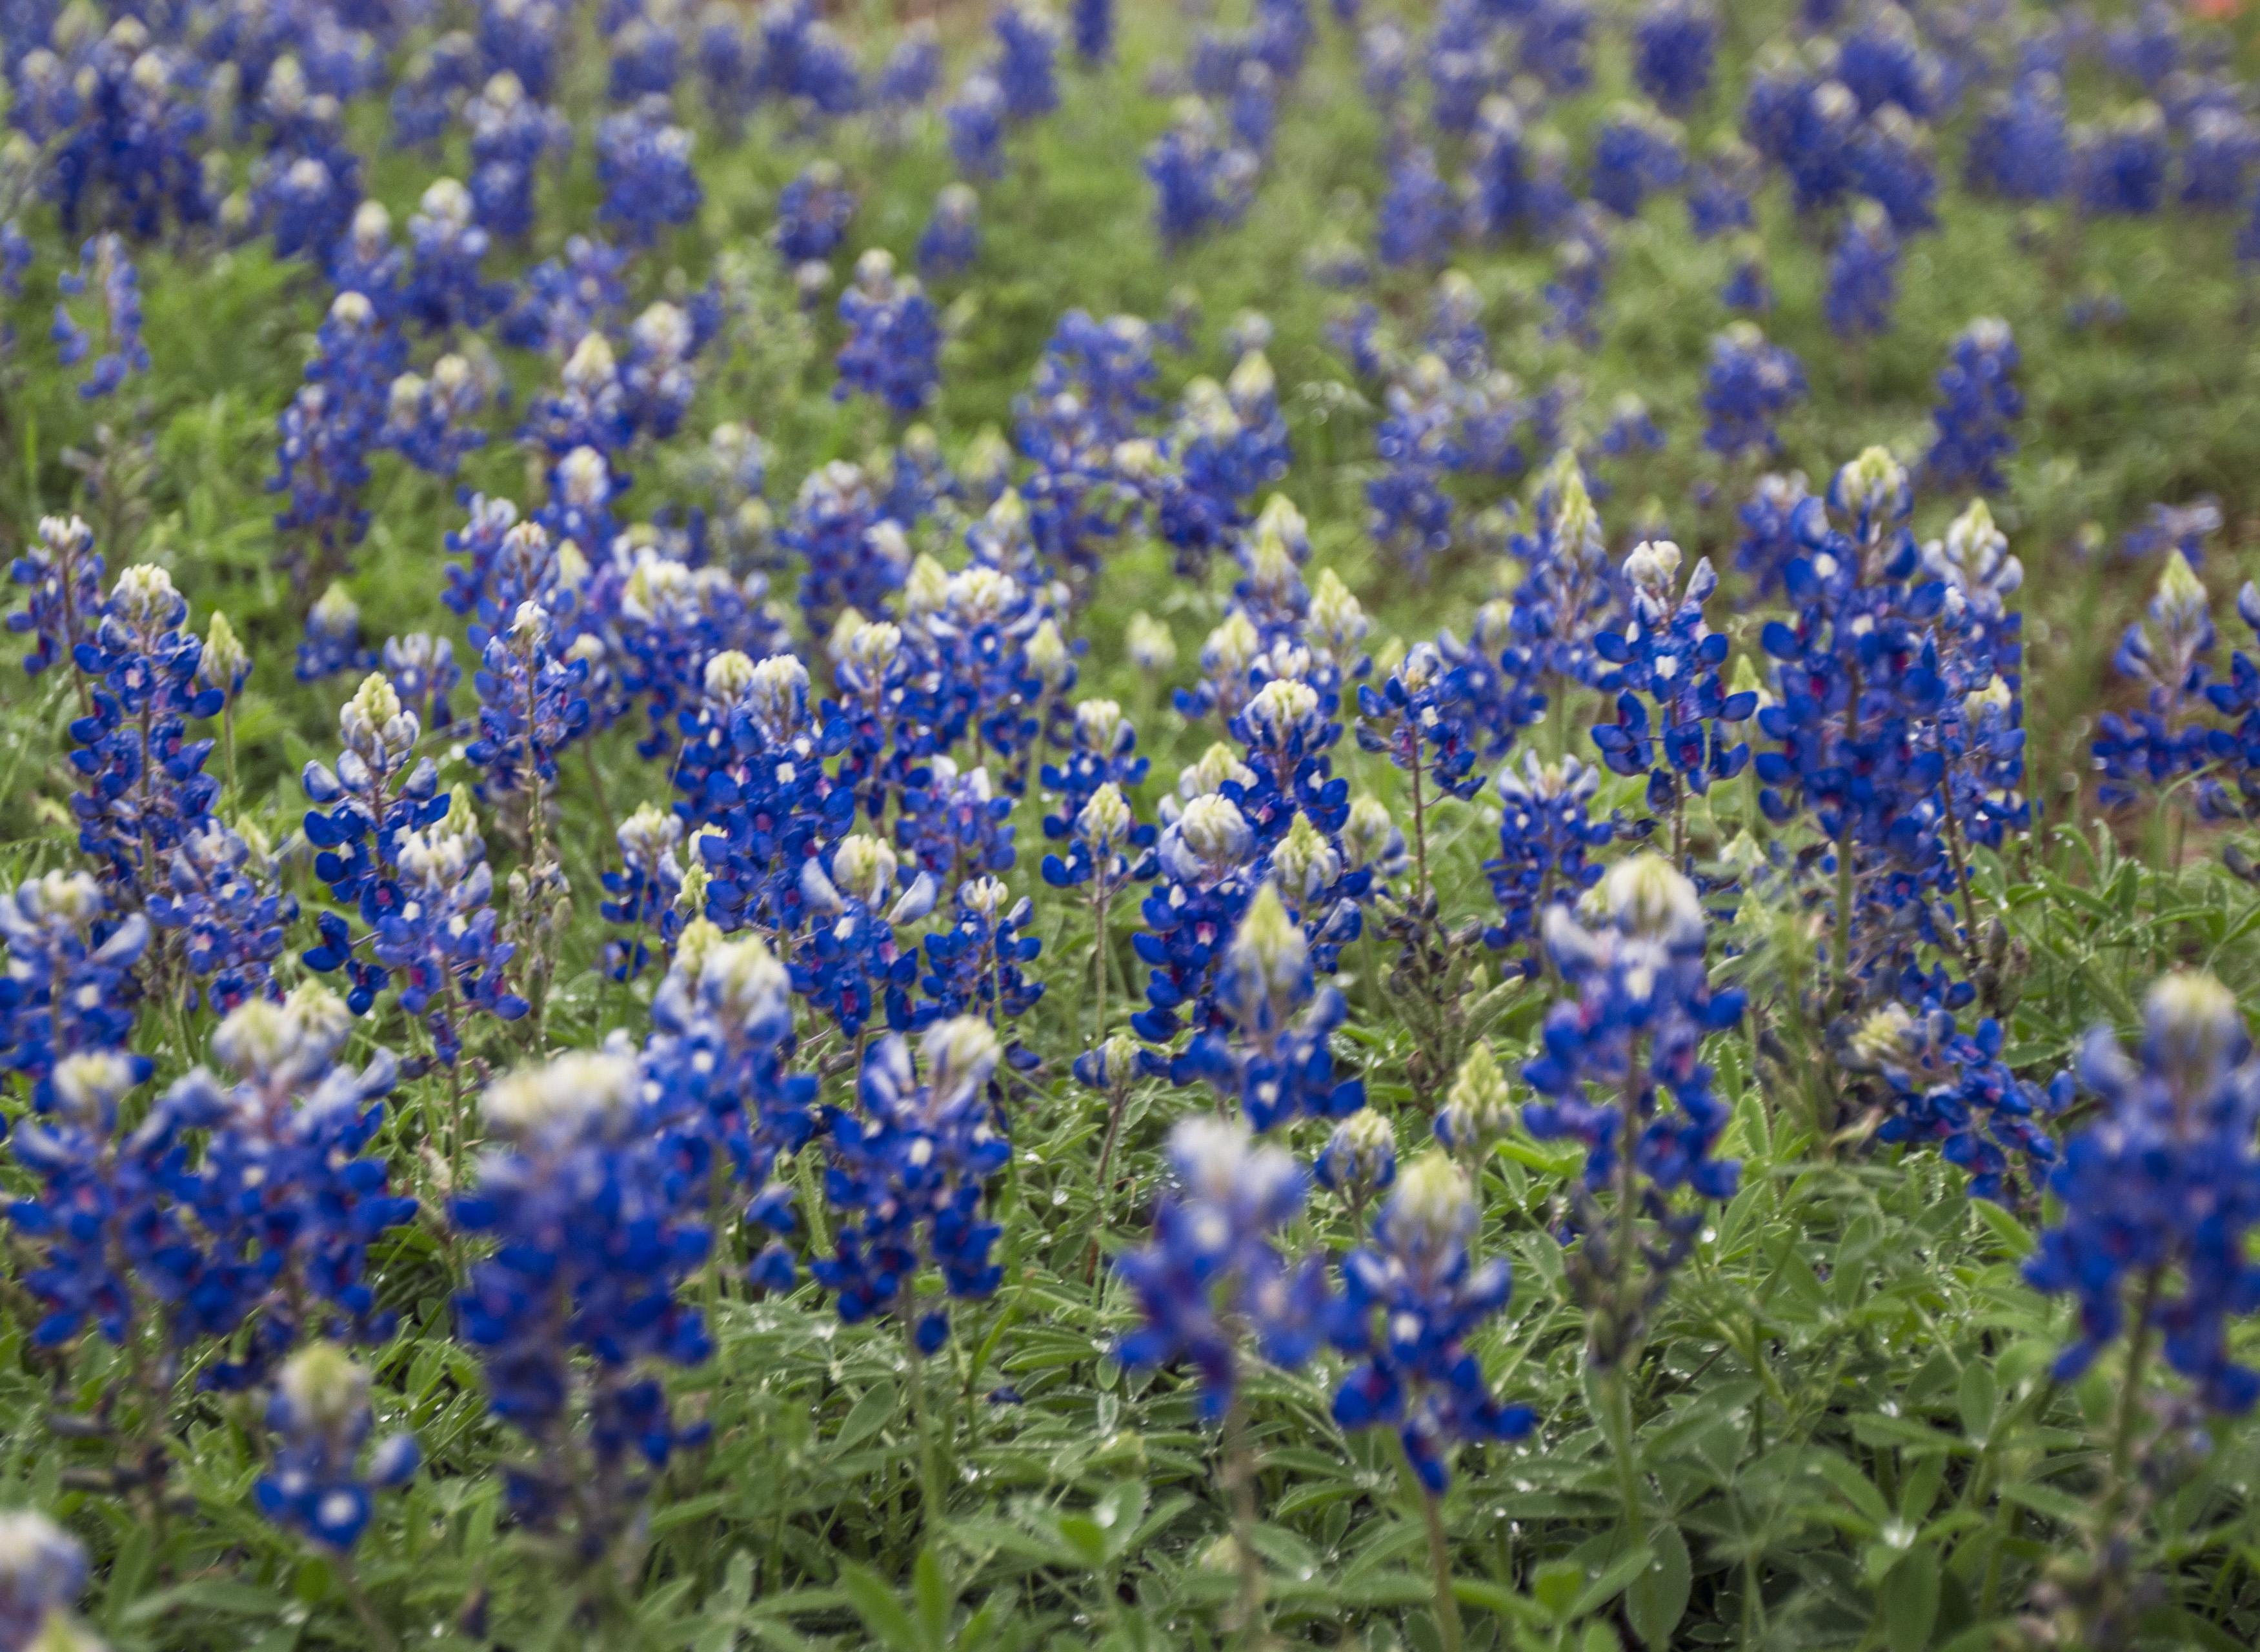 bluebonnet bloom update season looks promising but don u0027t pack up